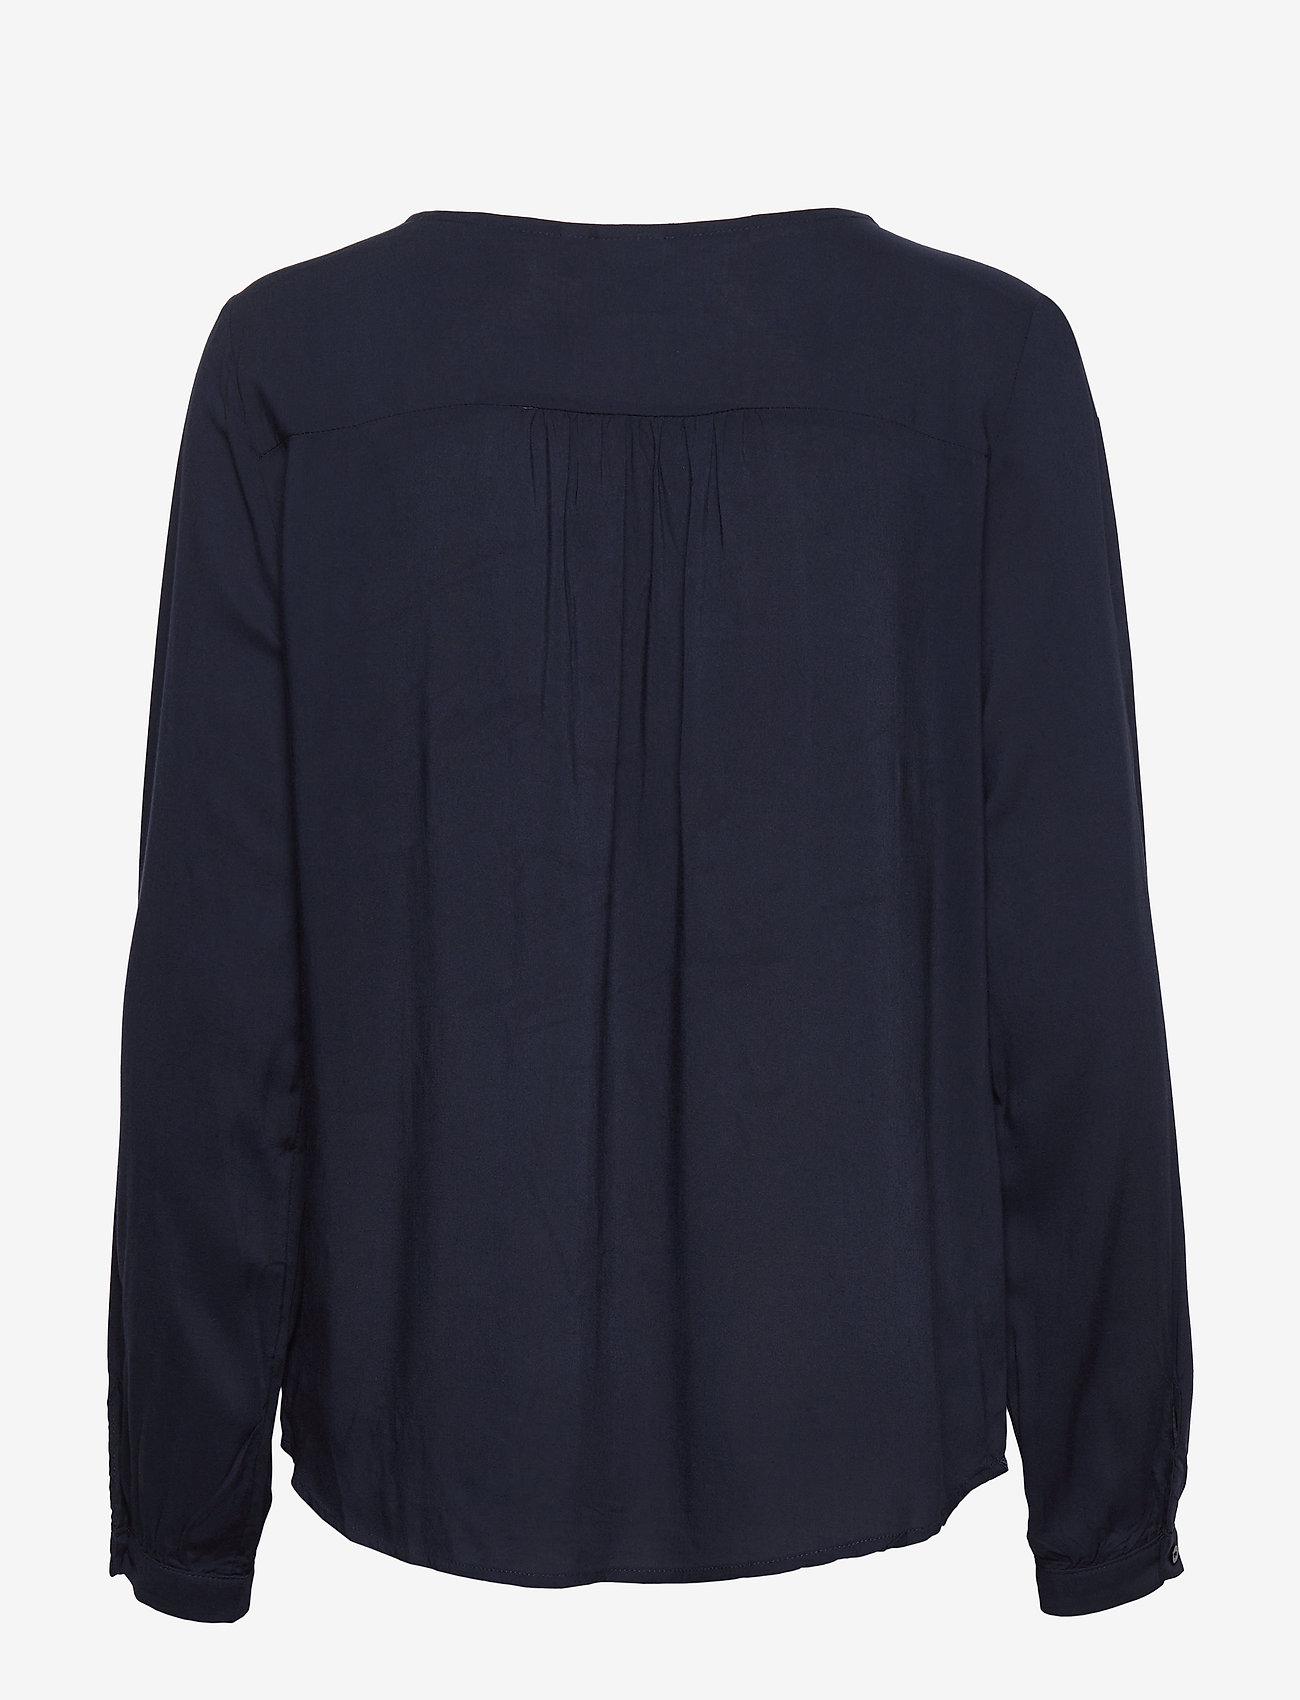 ICHI - IHMAJA LS - long sleeved blouses - total eclipse - 1